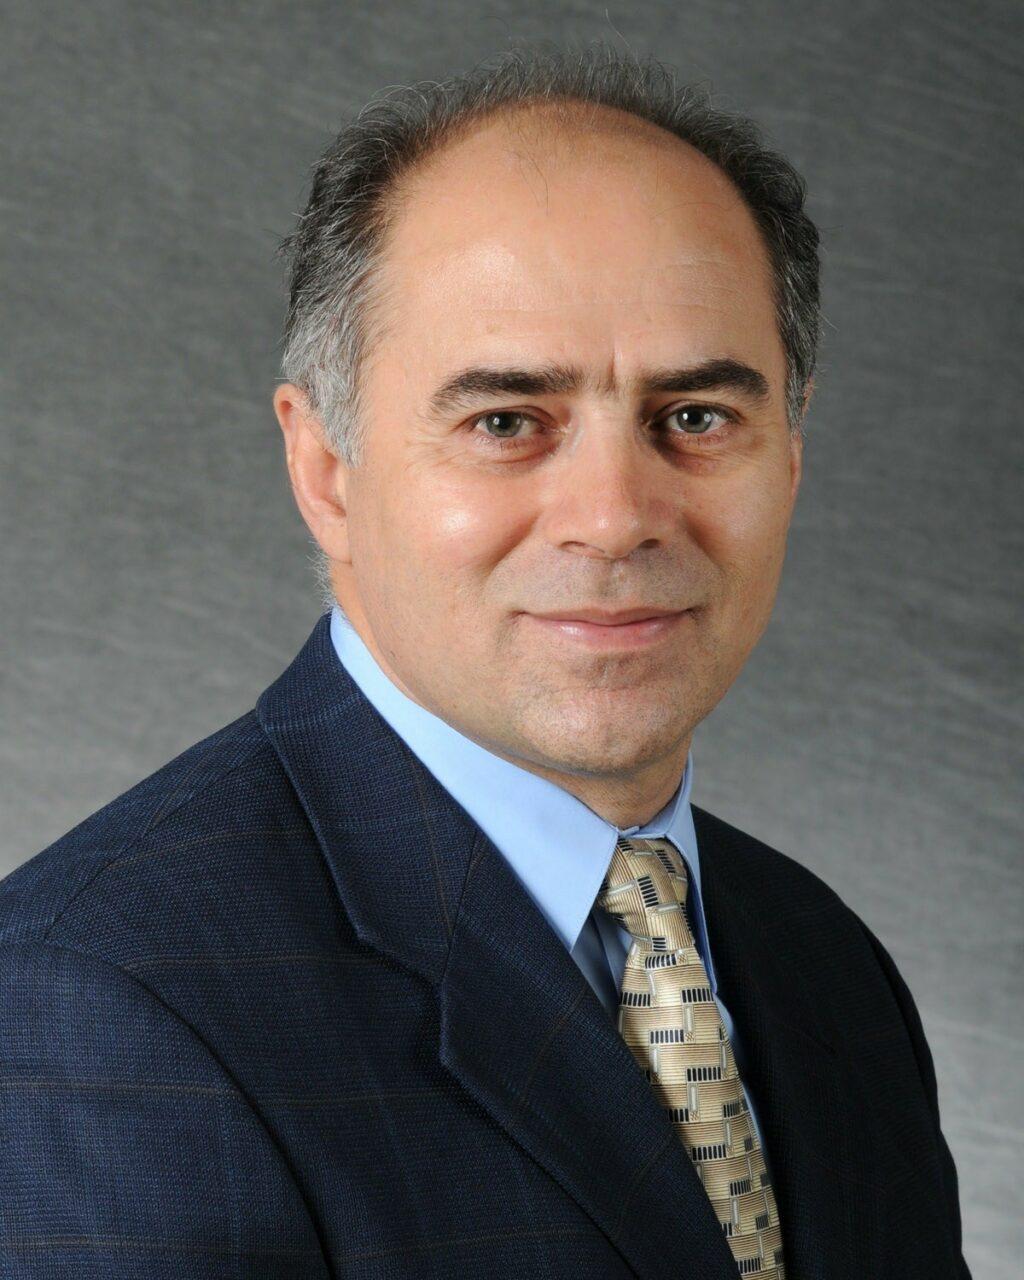 Nader Sadeghi